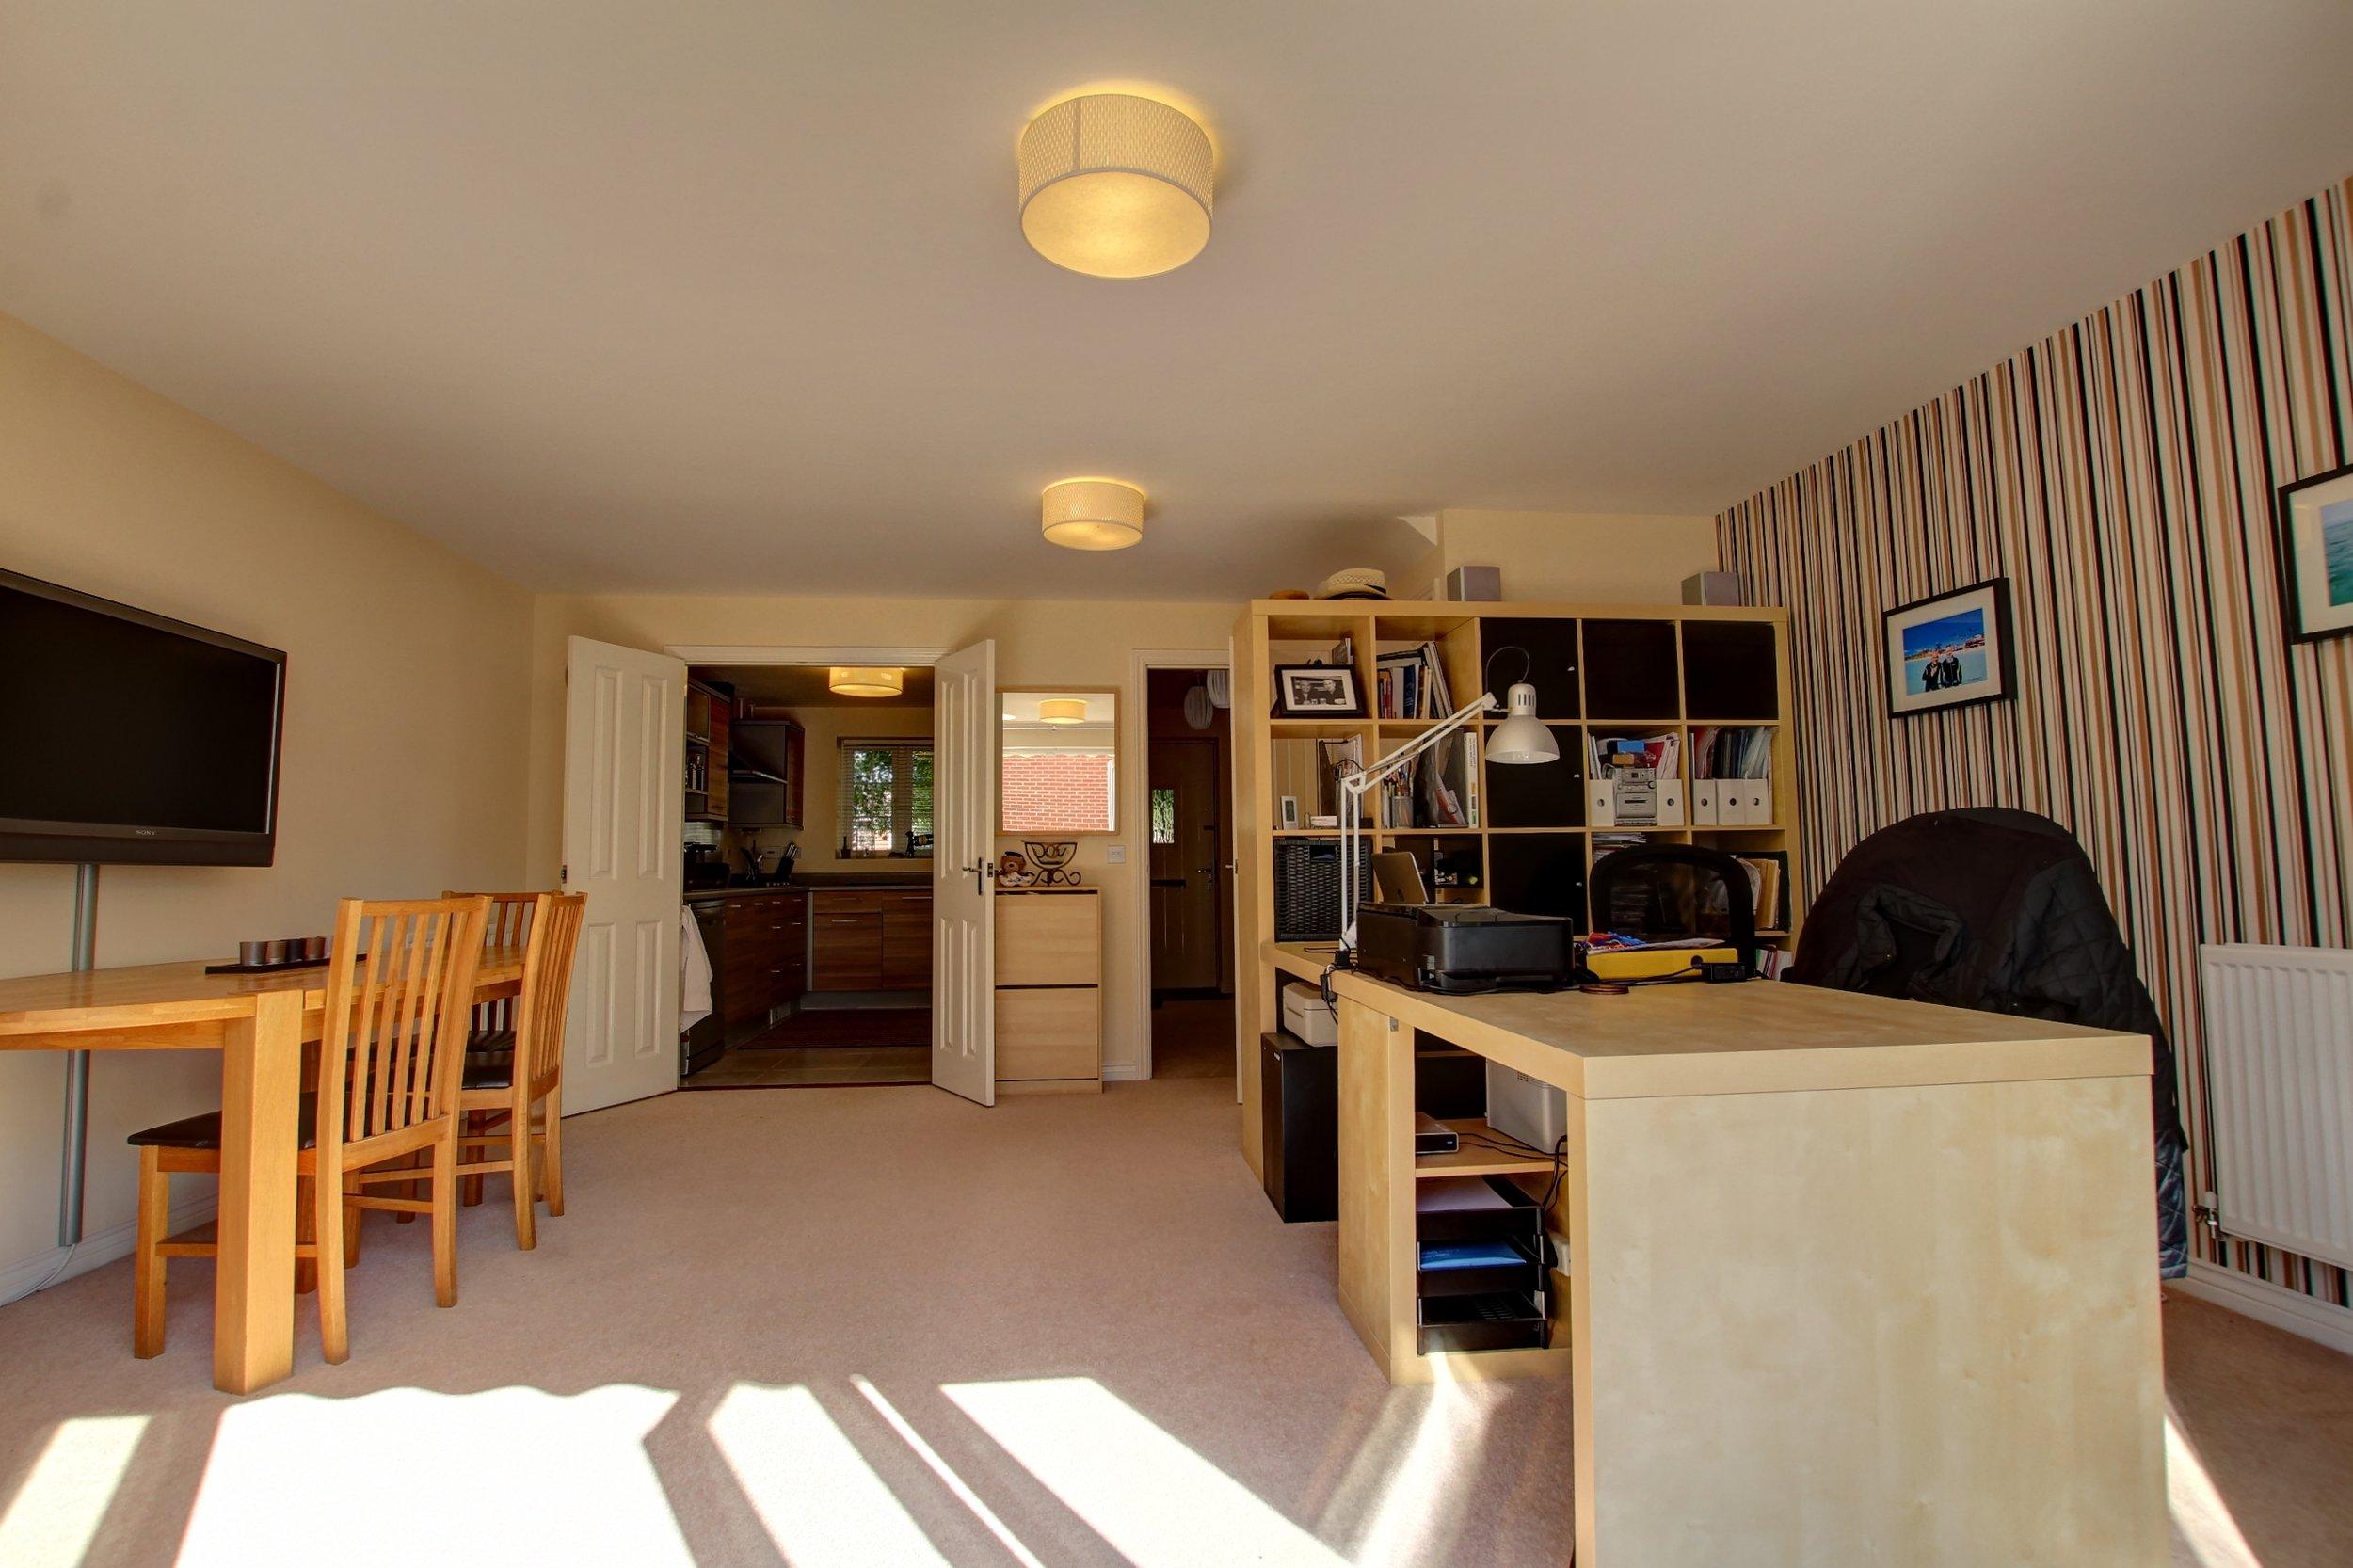 18 family room iii.jpg